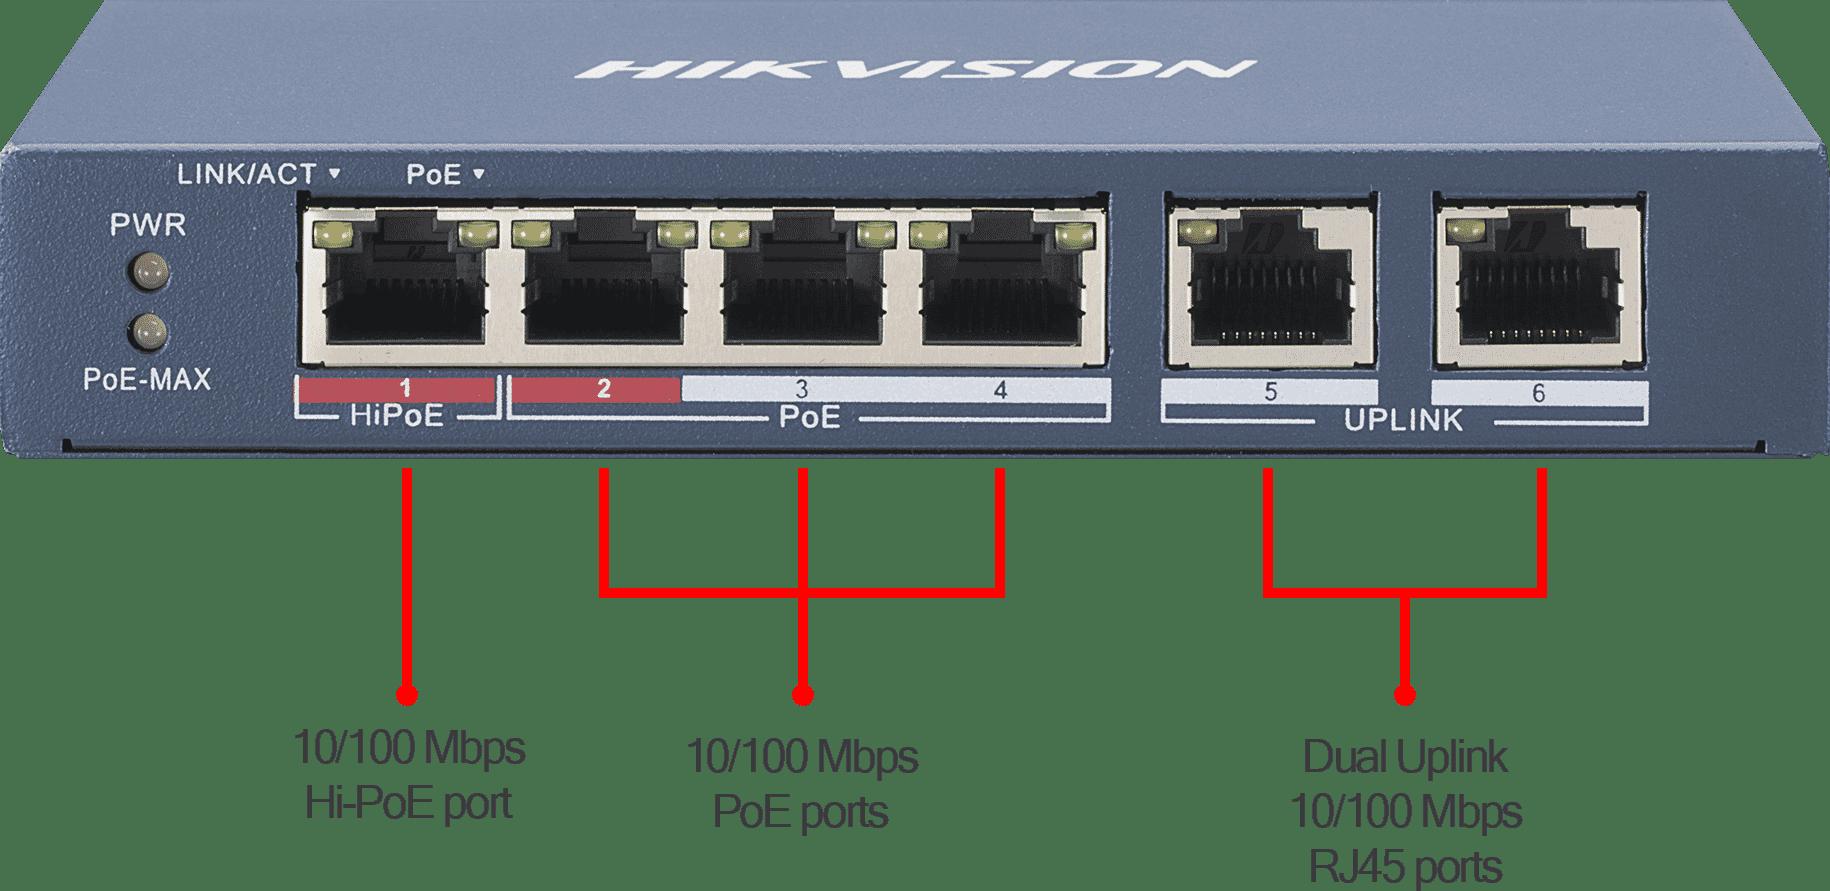 DS-3E0106HP-E_Ports.png